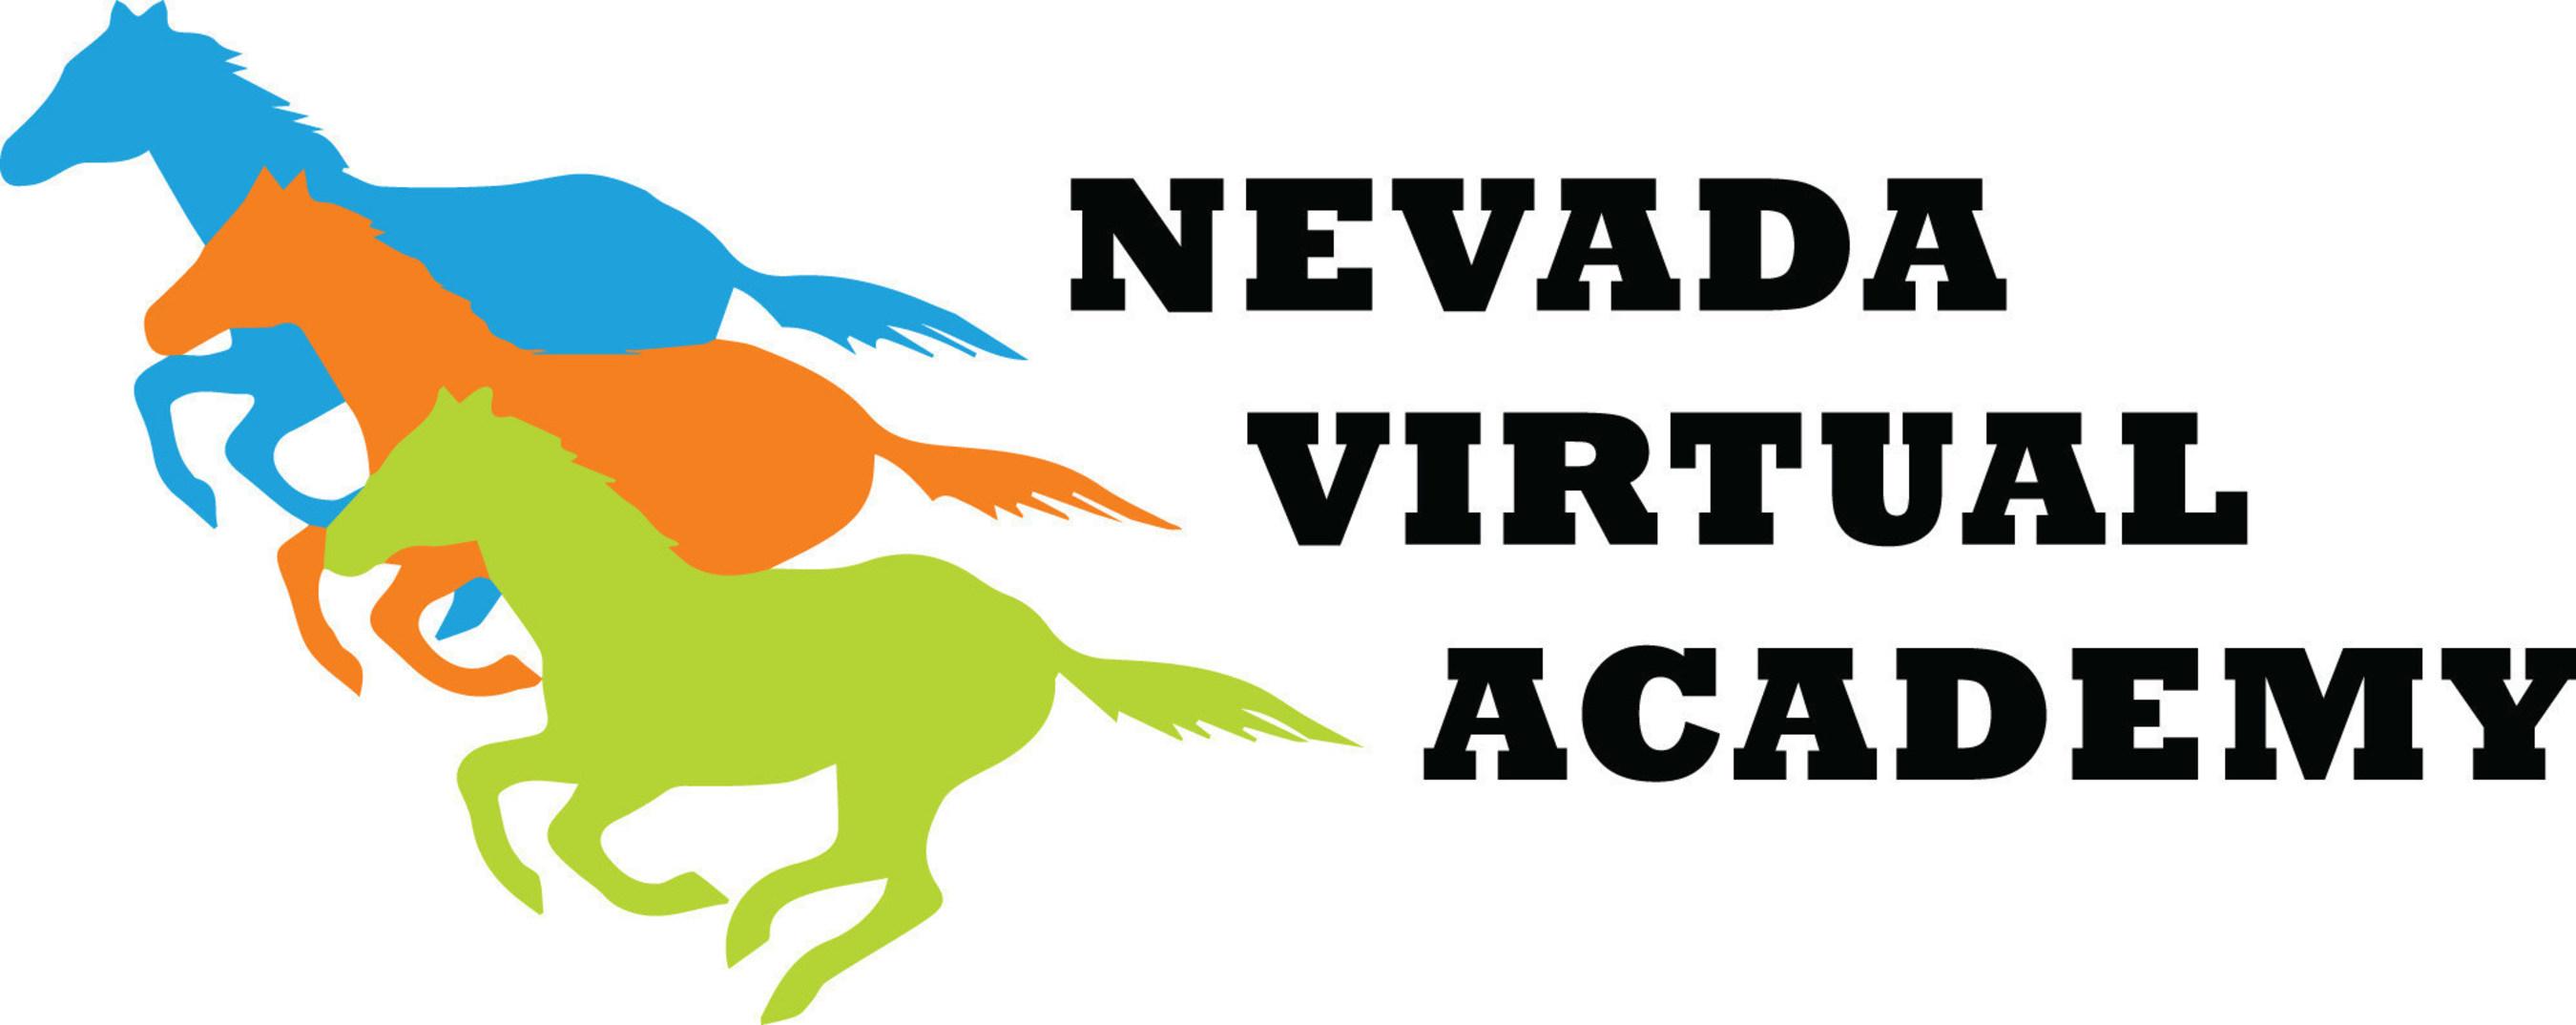 Online High School Graduates From Nevada Virtual Academy Receive